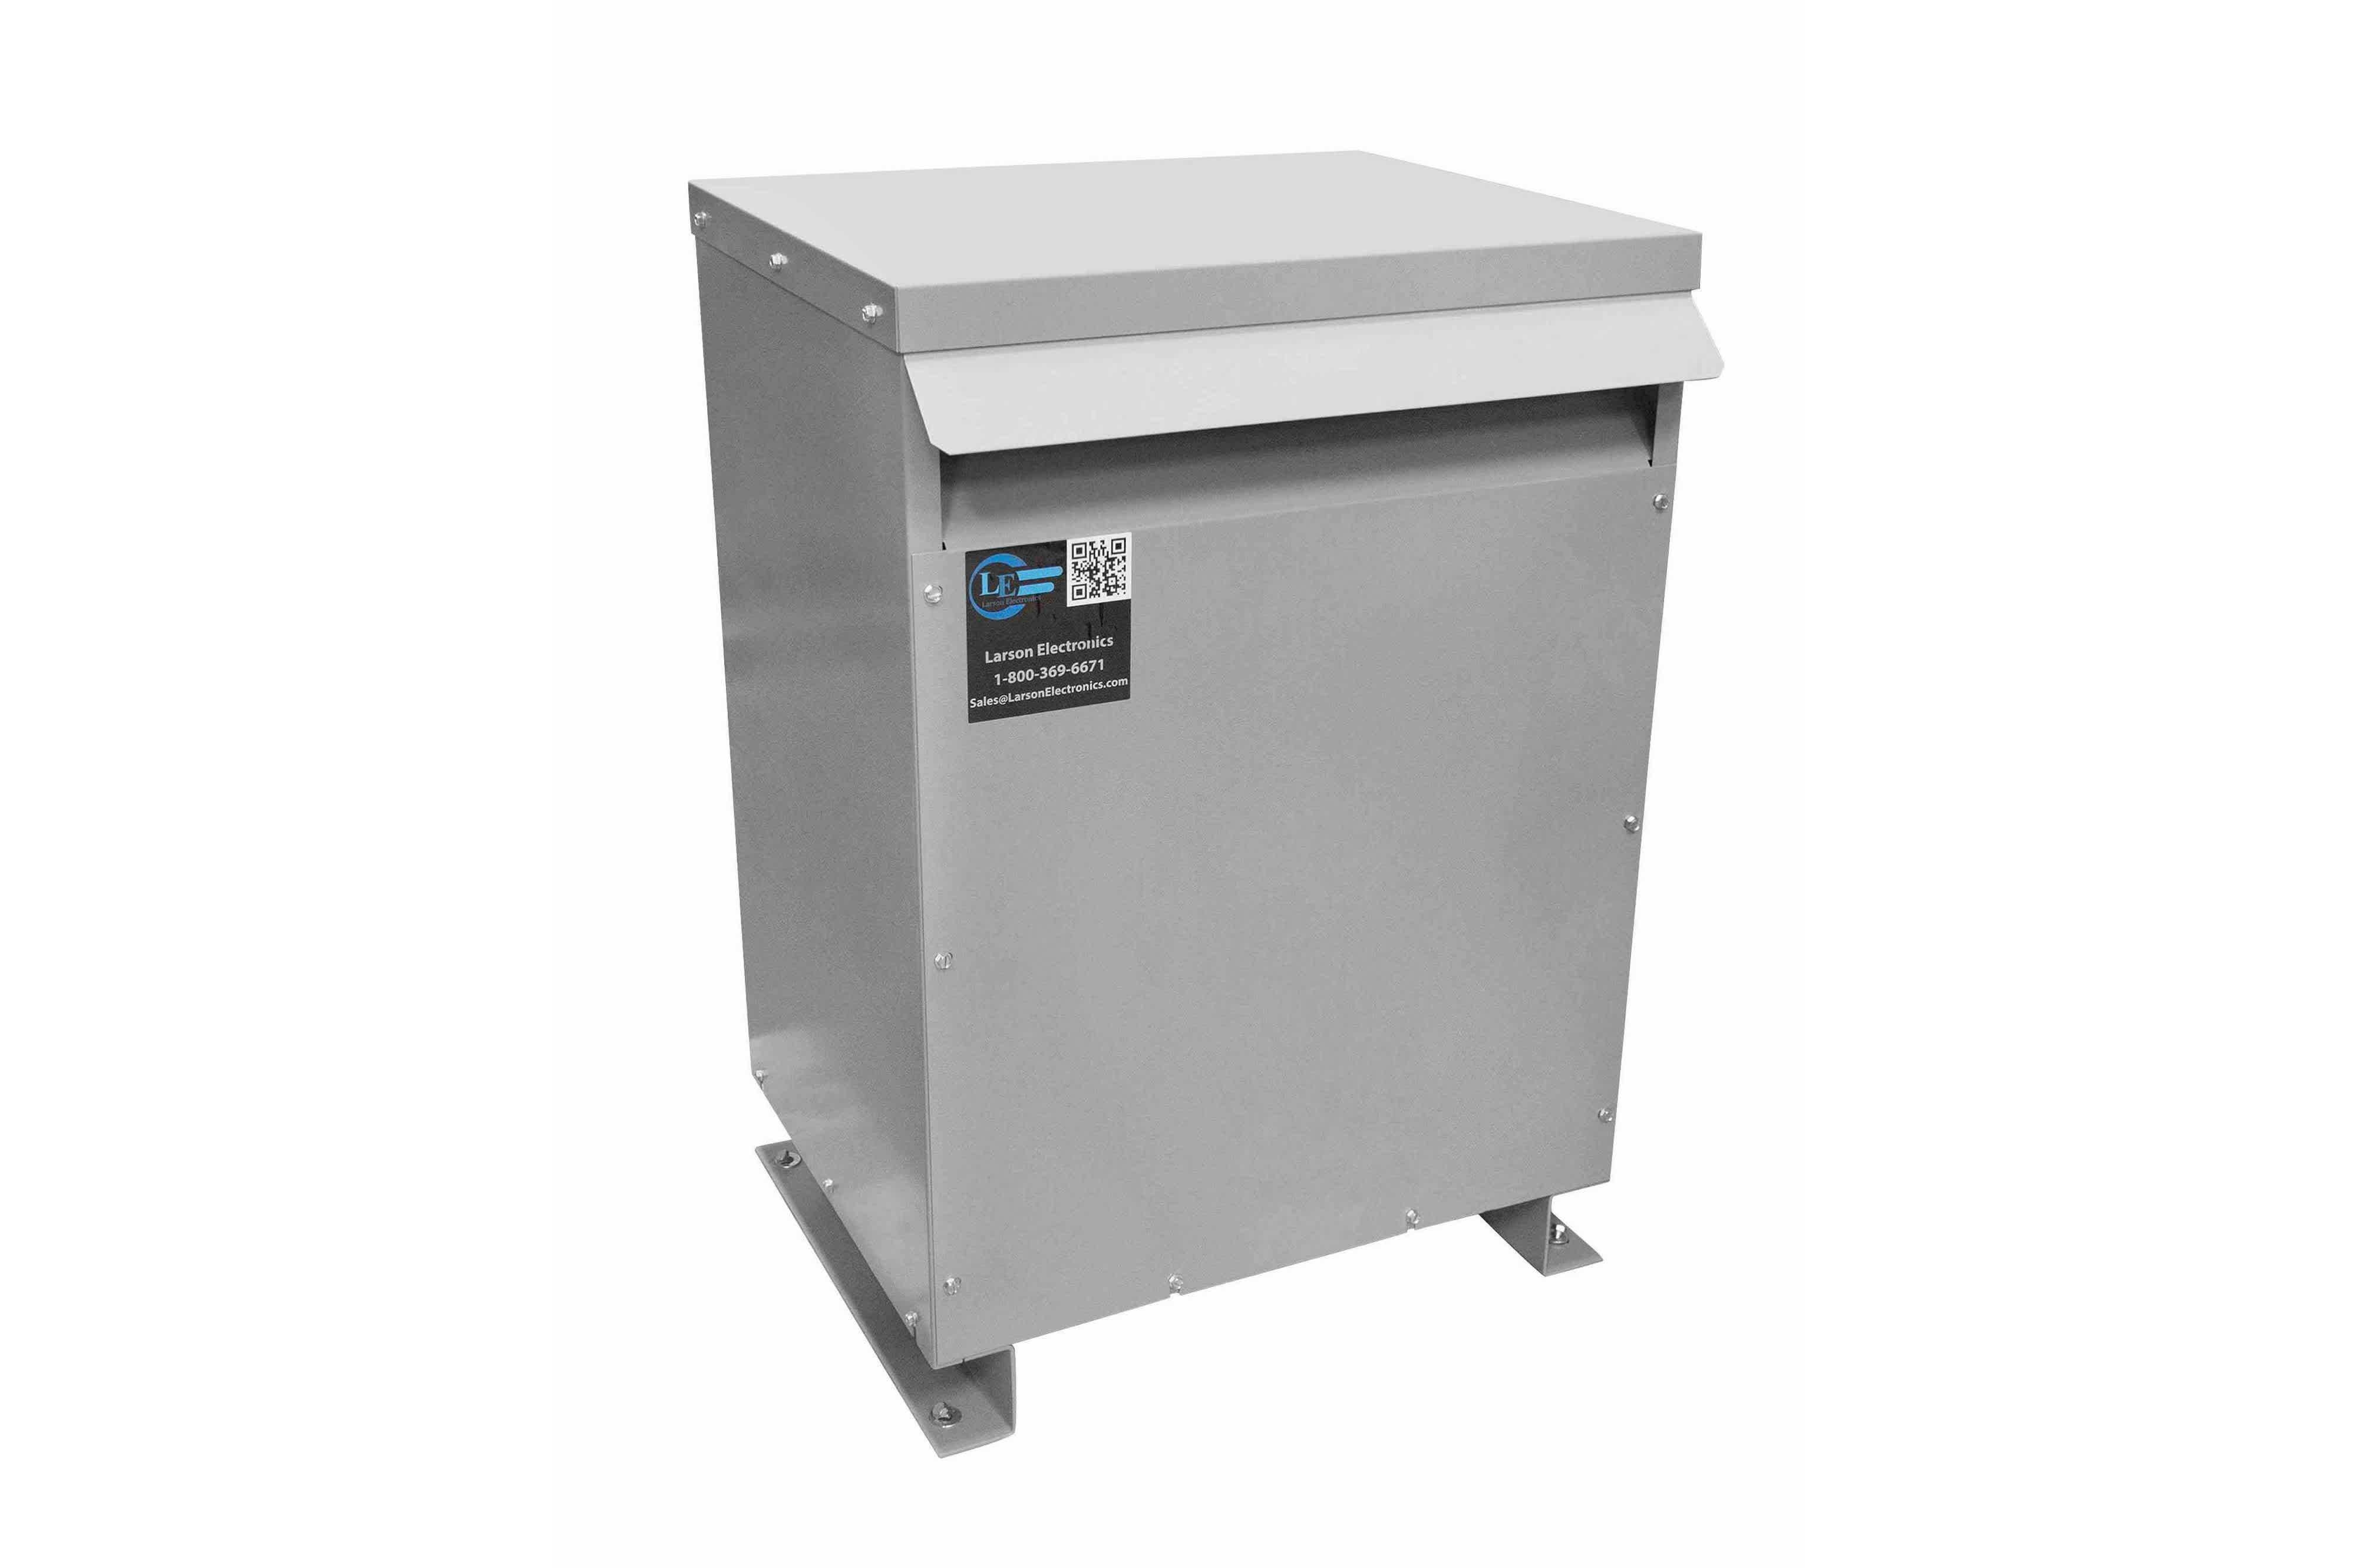 60 kVA 3PH Isolation Transformer, 600V Wye Primary, 380V Delta Secondary, N3R, Ventilated, 60 Hz